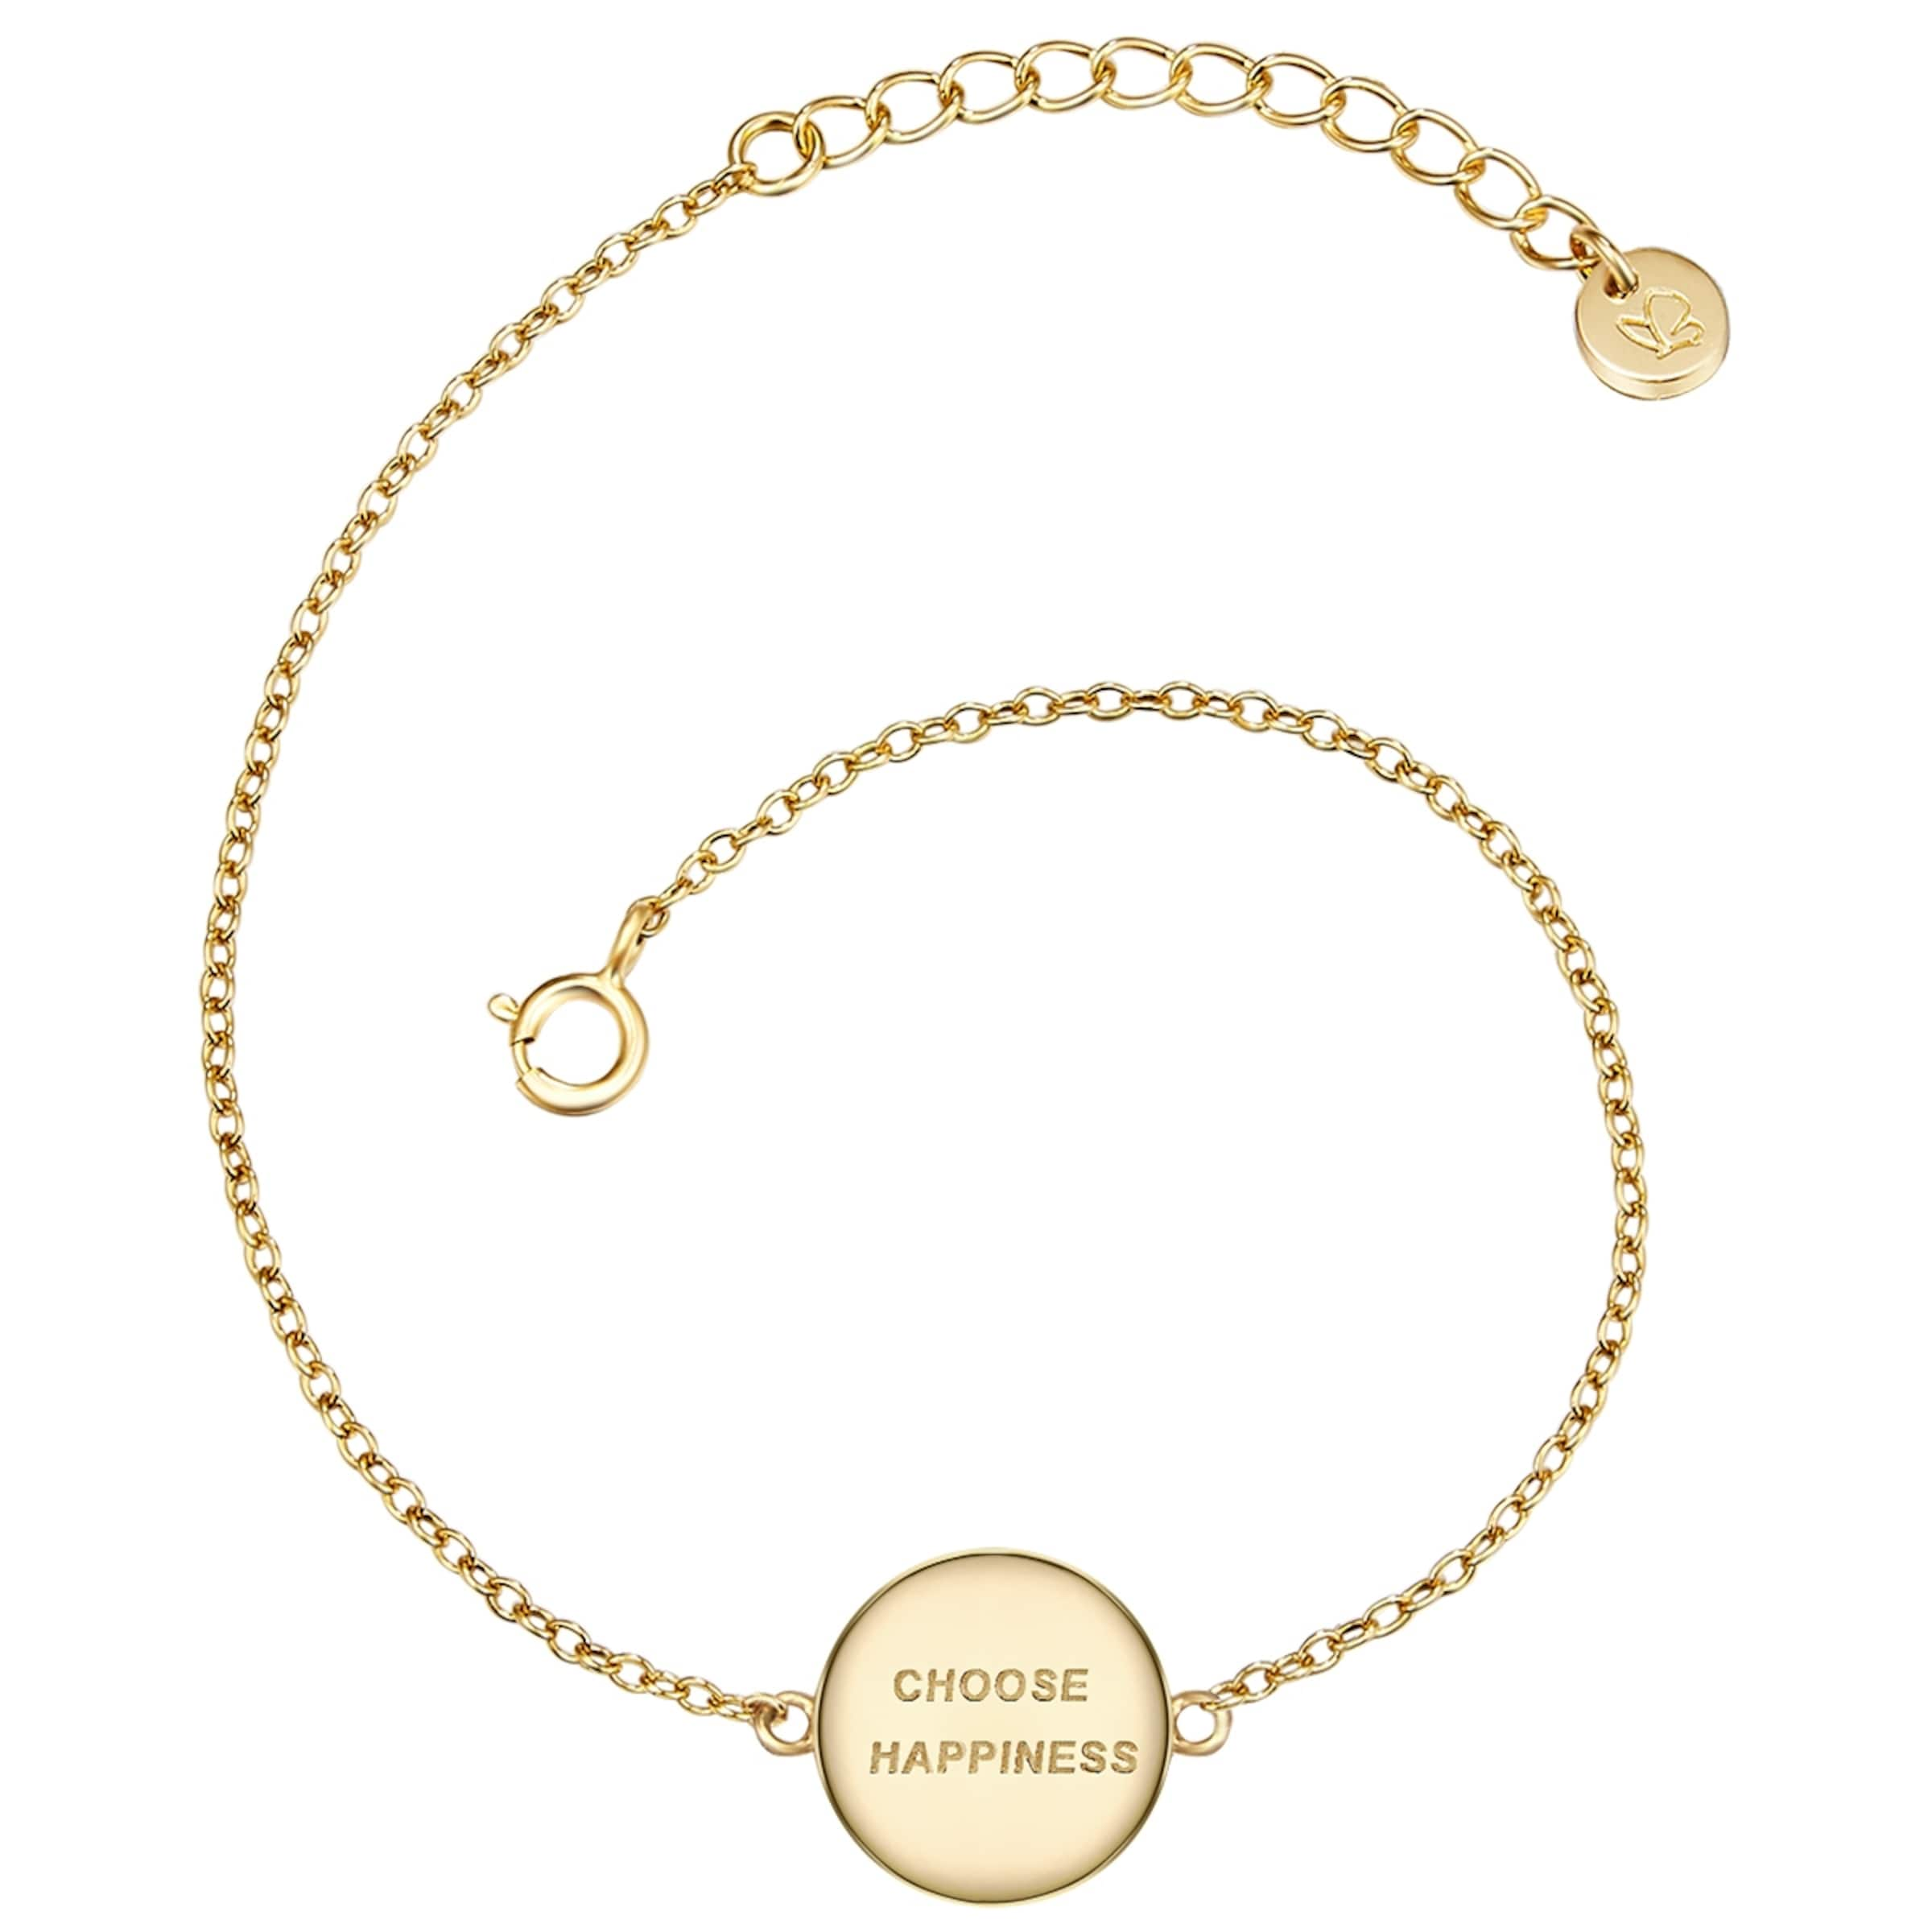 Gold München Glanzstücke Armband Gold Glanzstücke In München Armband In Yf7gy6vb